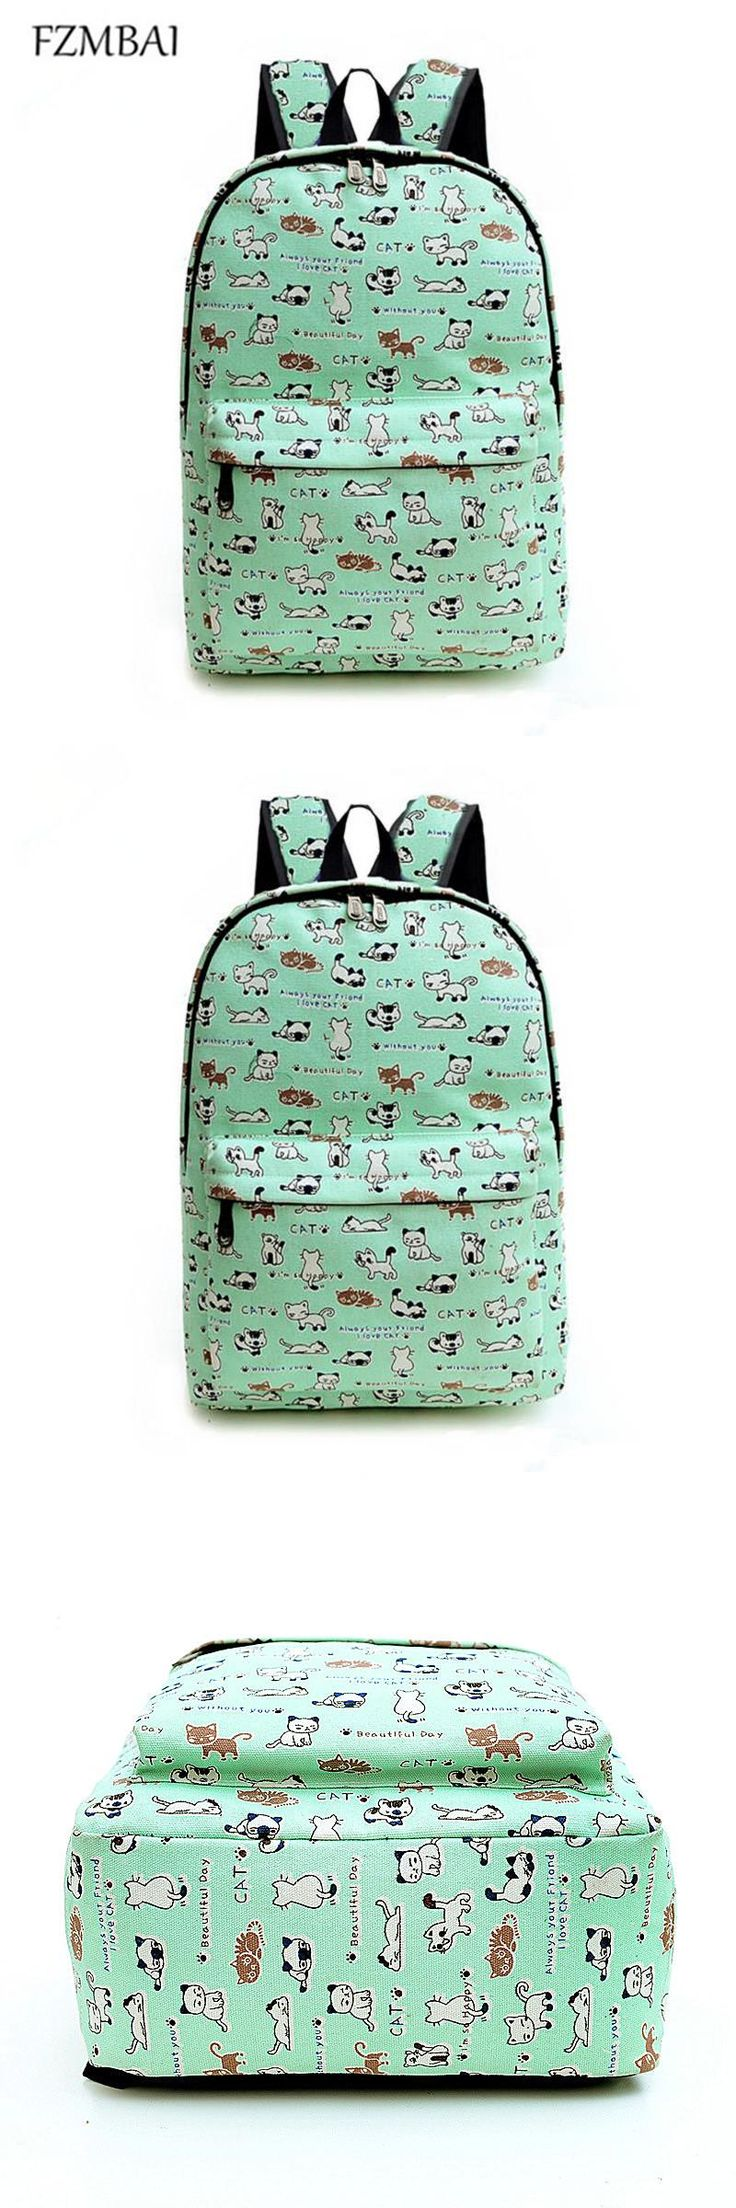 [Visit to Buy] FZMBAI 2017 Preppy Style Kitten Printing Backpacks Canvas Travel Bag Cute Cartoon Cat School Bags #Advertisement